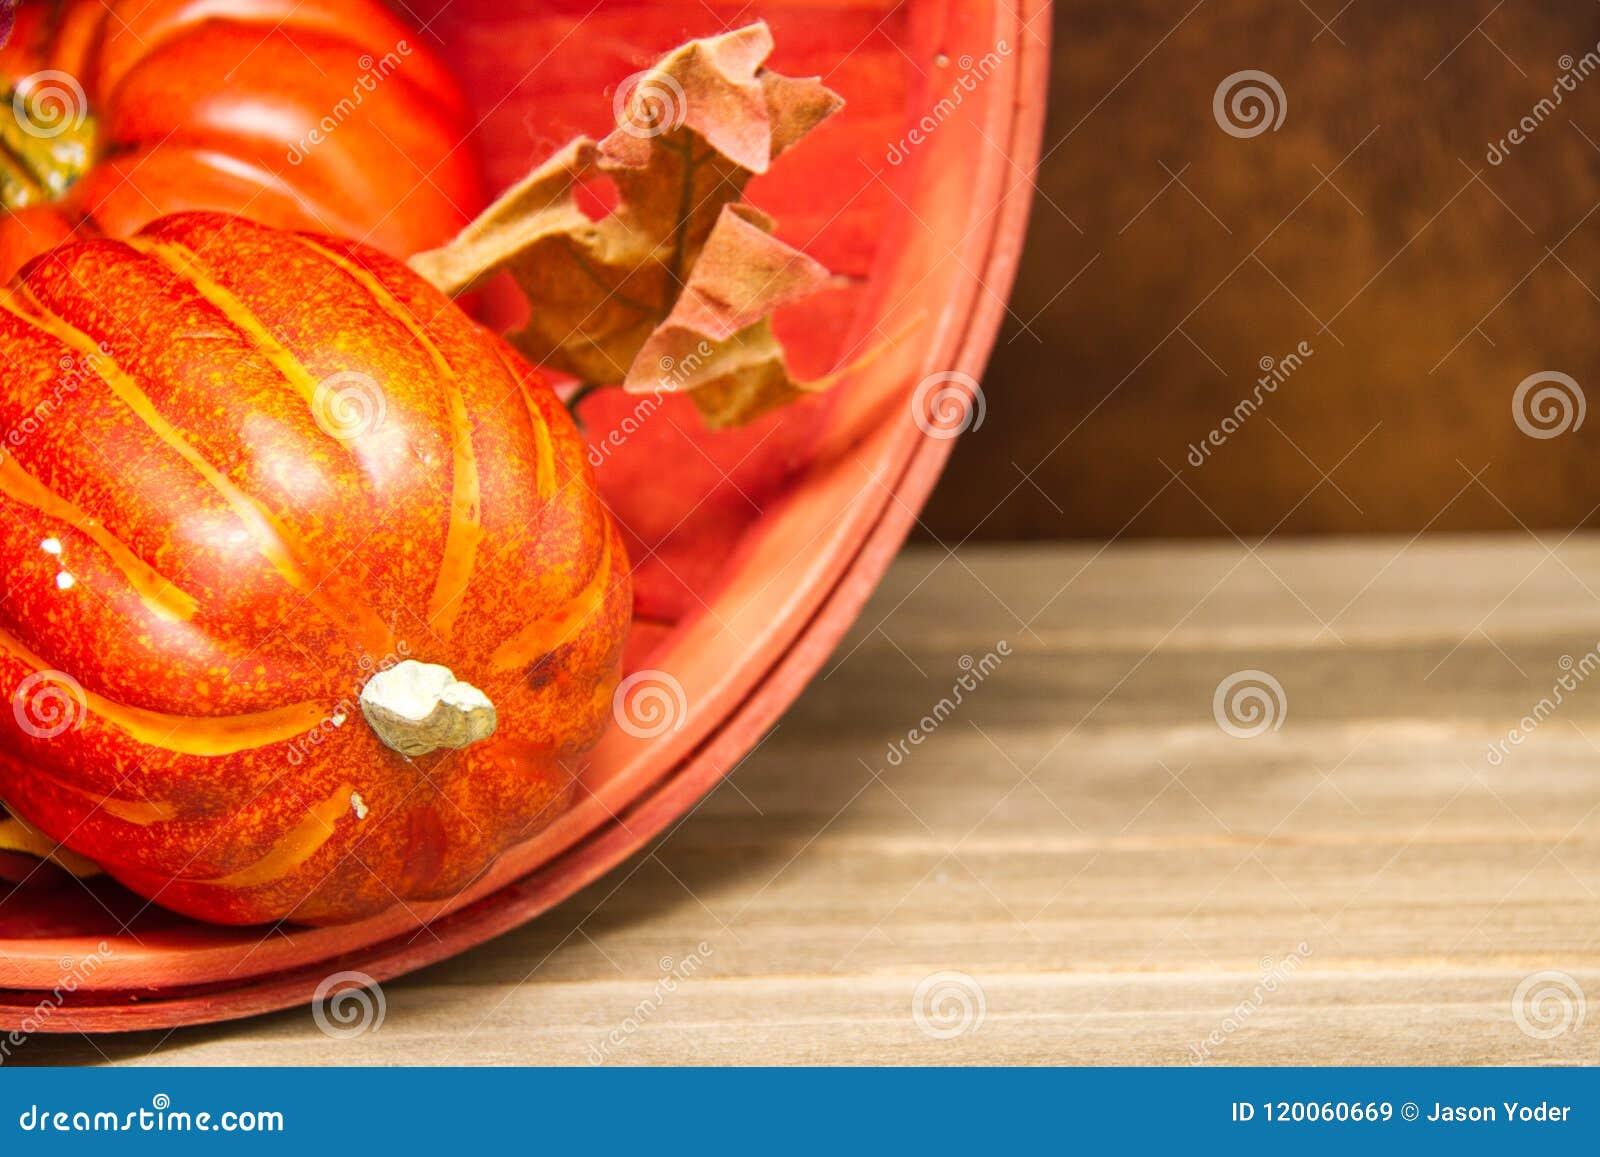 pumpkin and orange bucket fall background stock image image of